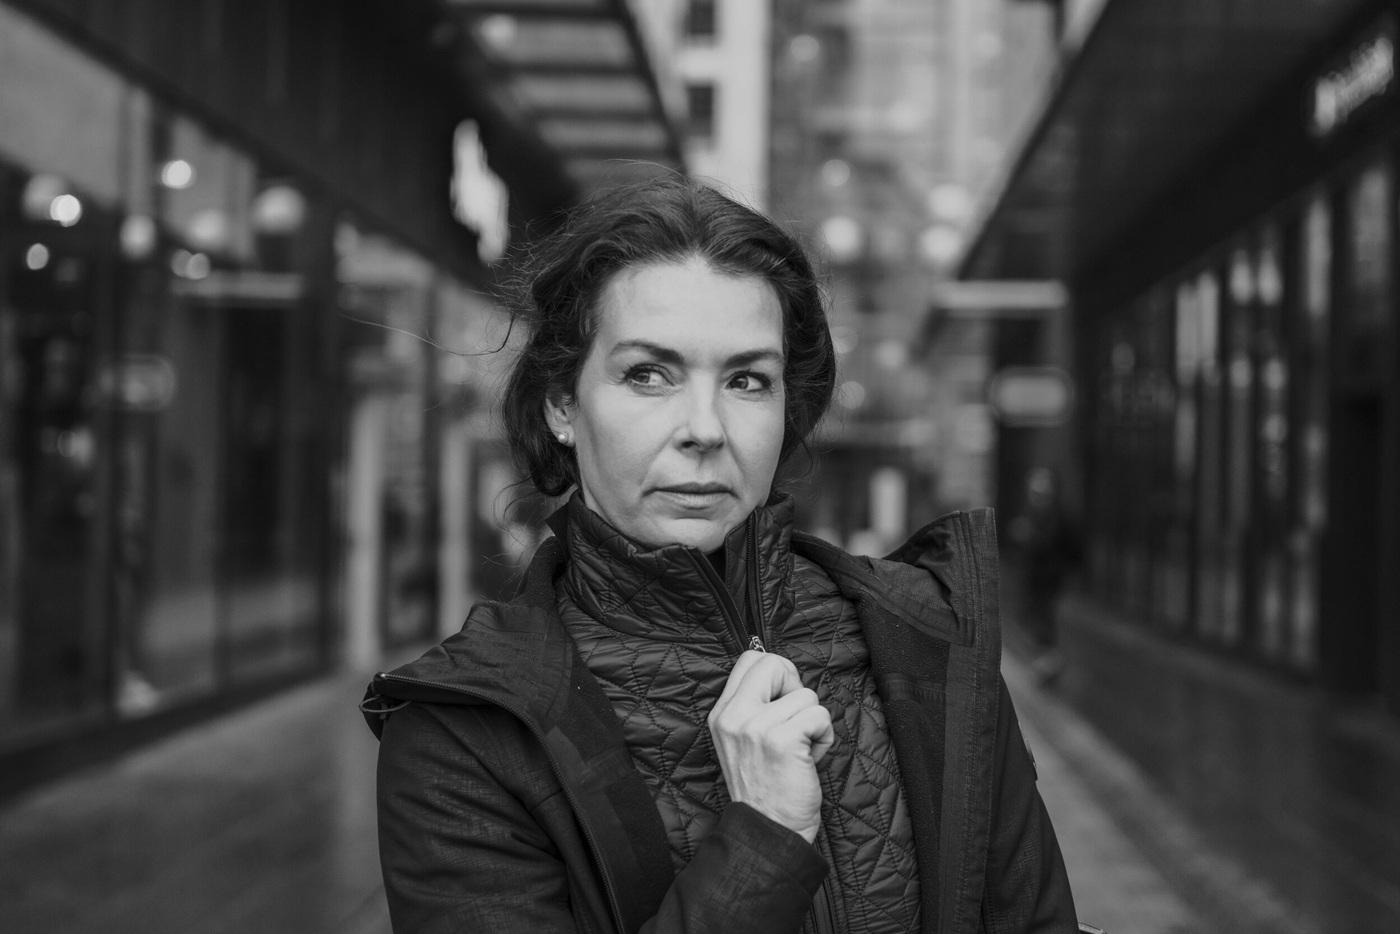 Daniel Nestor - Renata Clumska